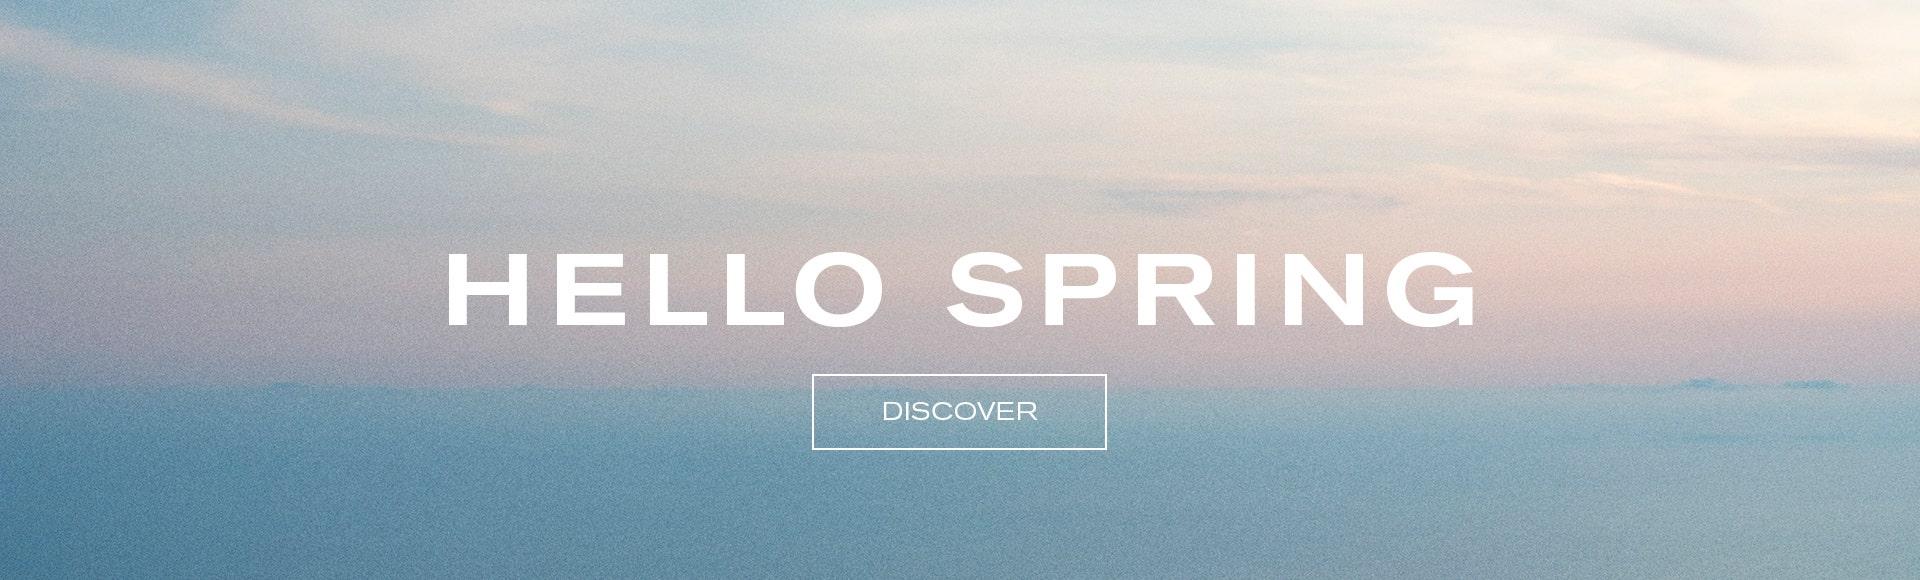 HELLO SPRING | Simone Pérèle